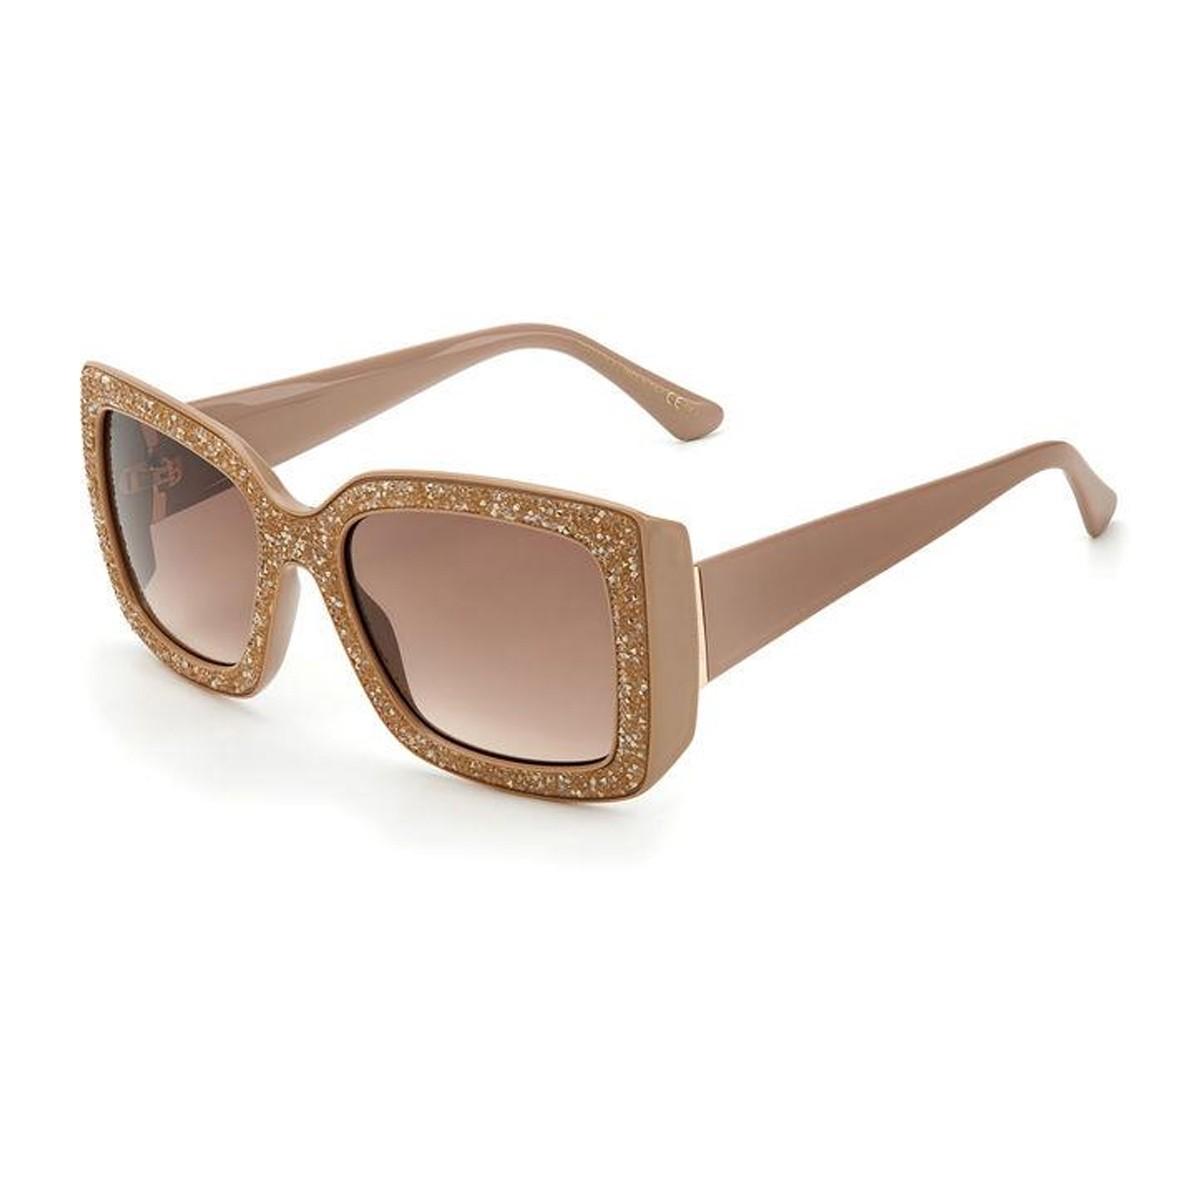 Jimmy Choo Viv/s   Women's sunglasses